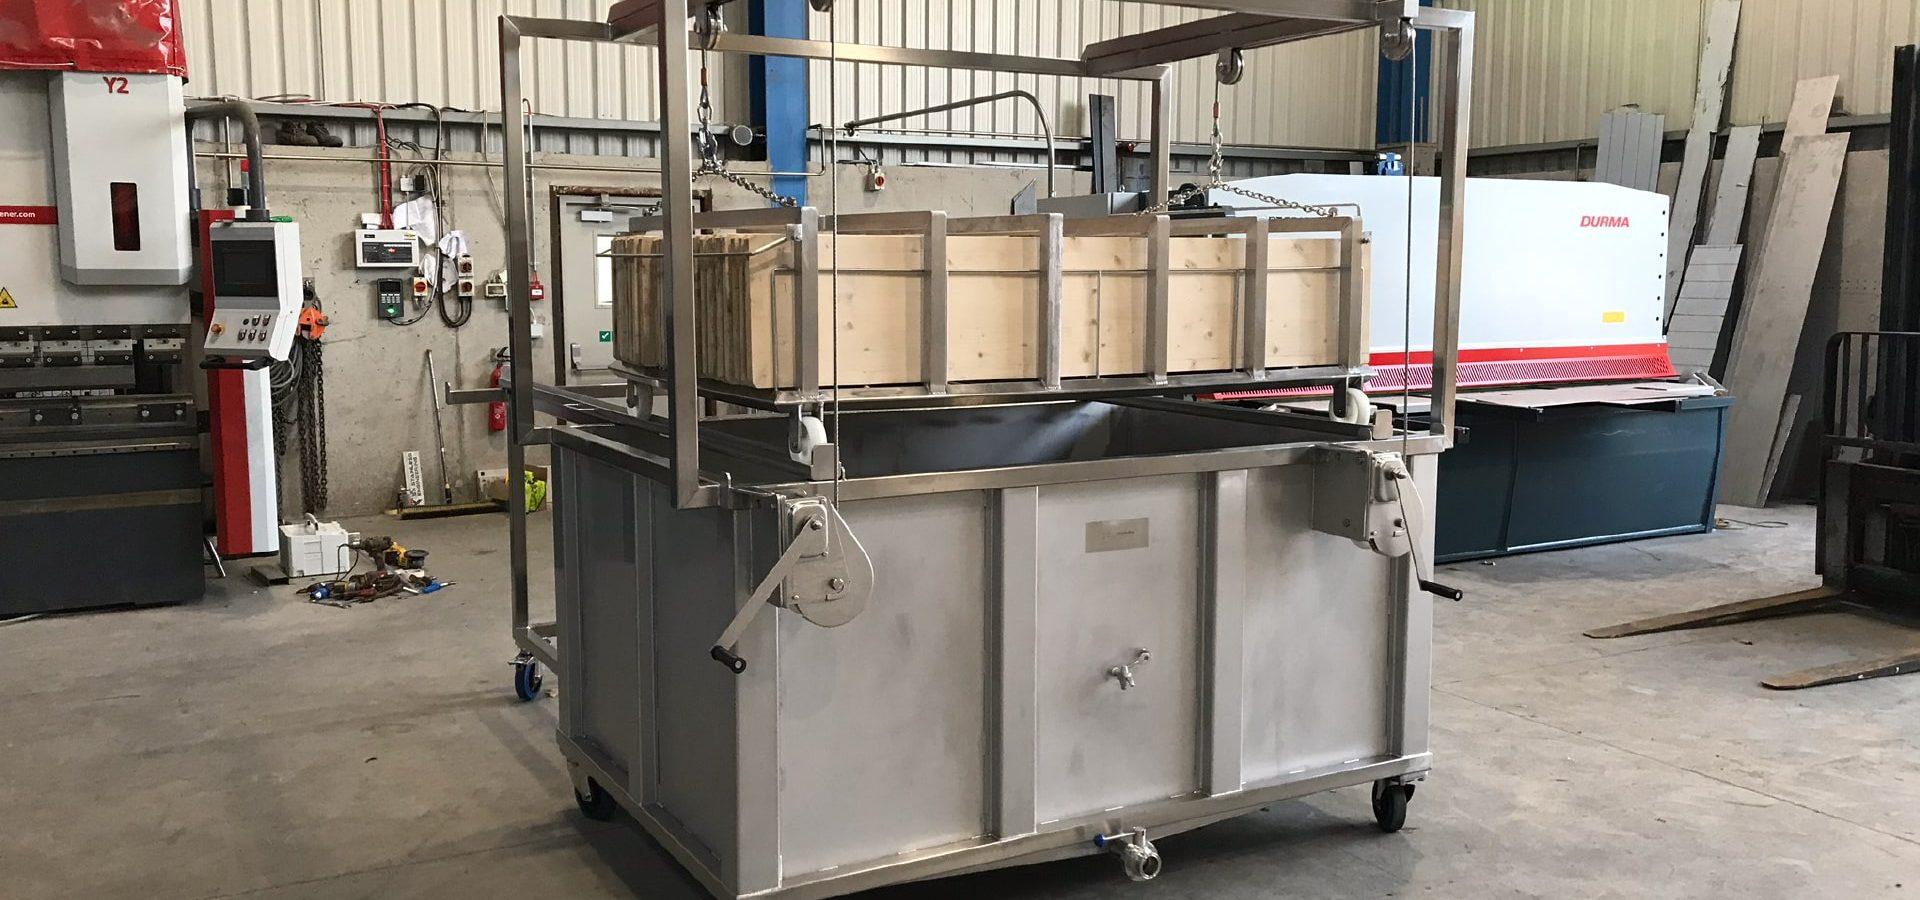 Bespoke Fabrications - SX Engineering - TINE cheese board washing tank